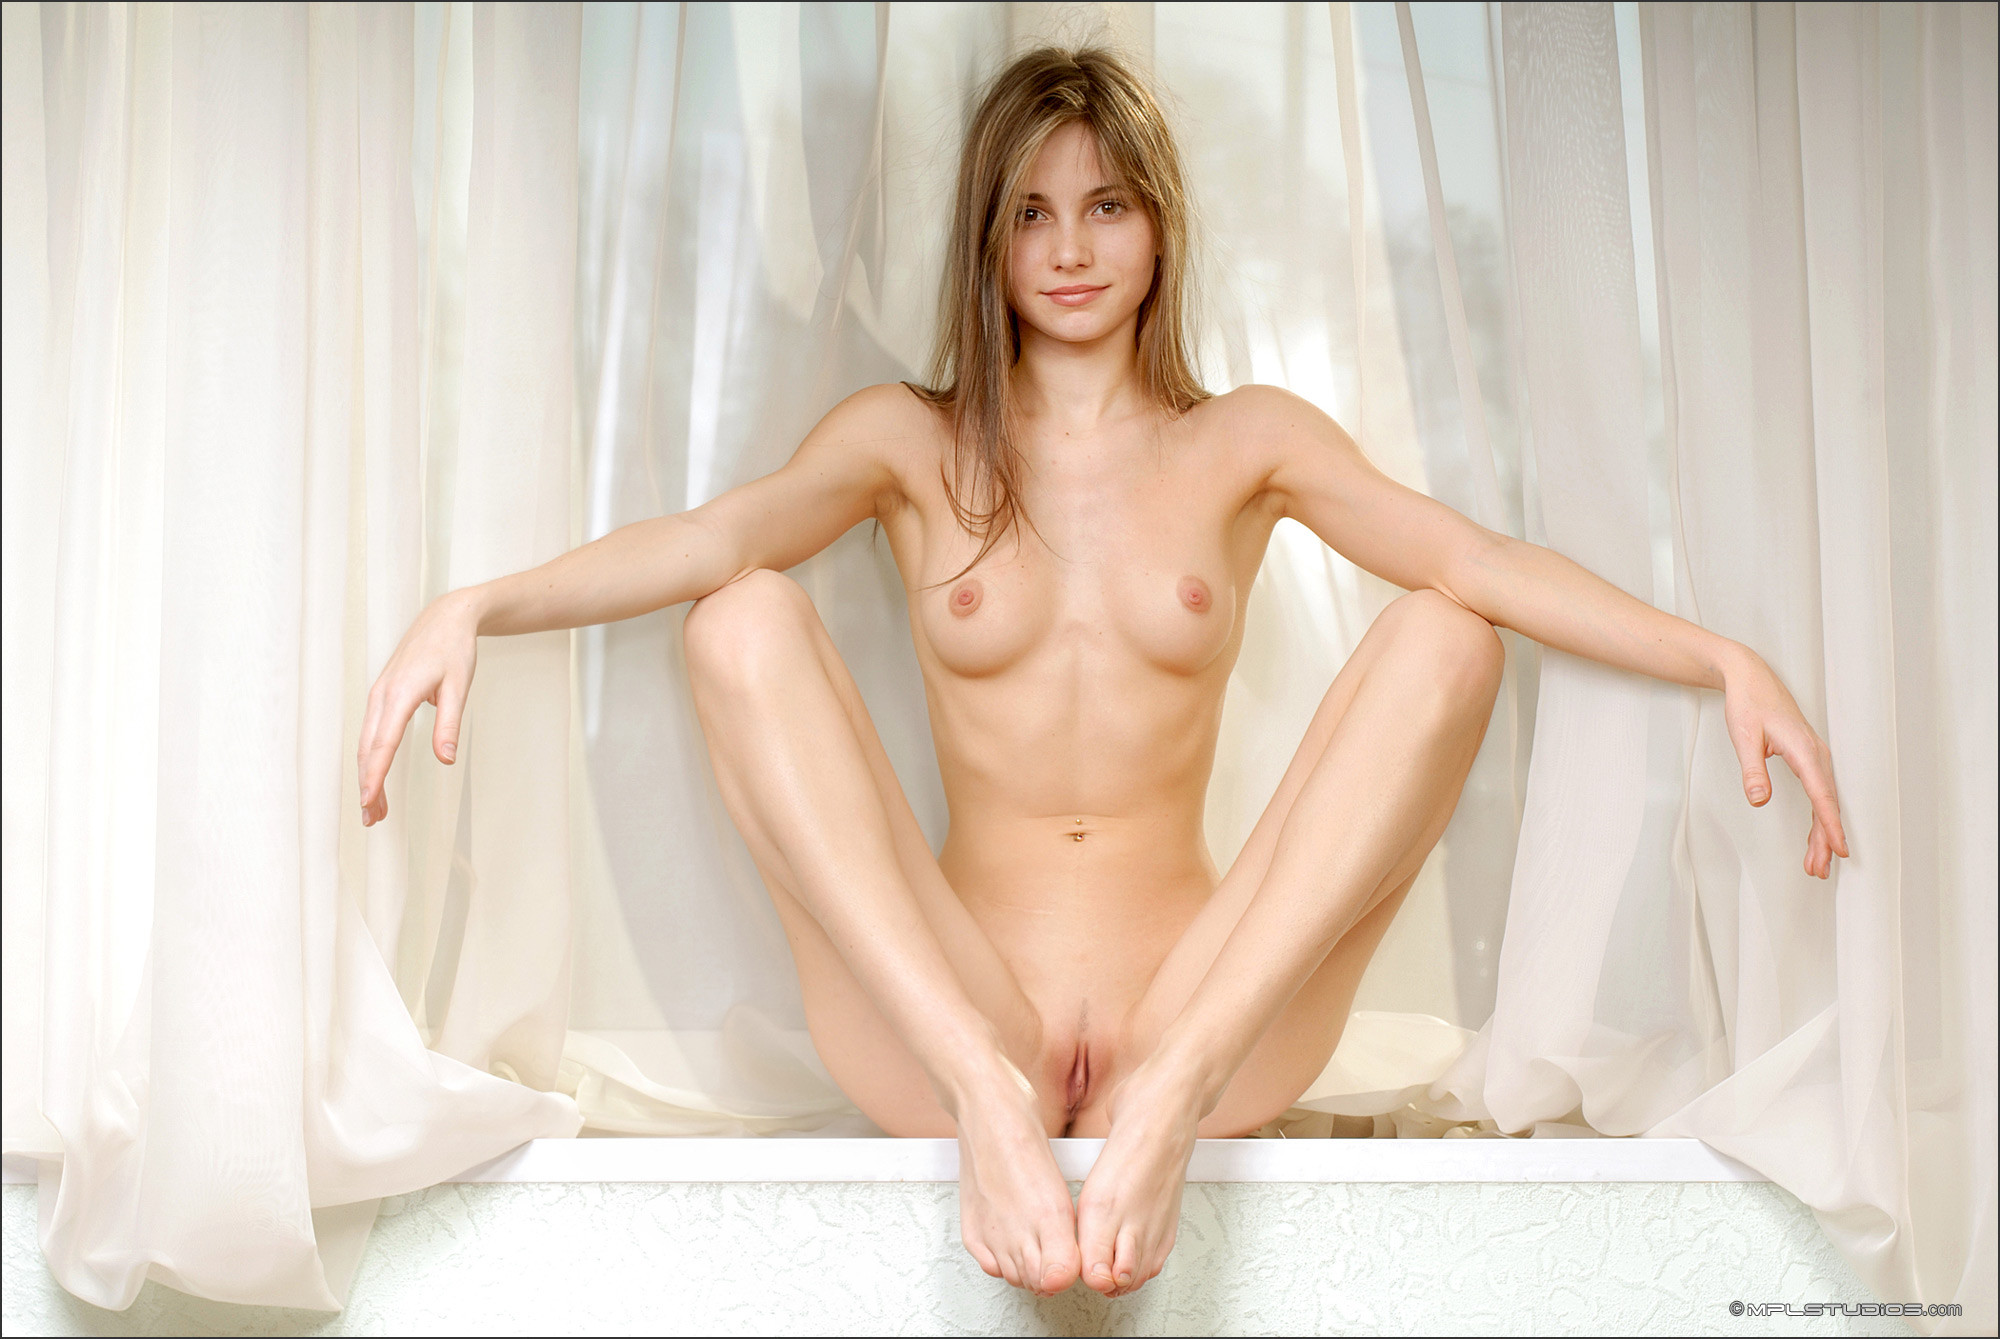 Nude women in military uniform